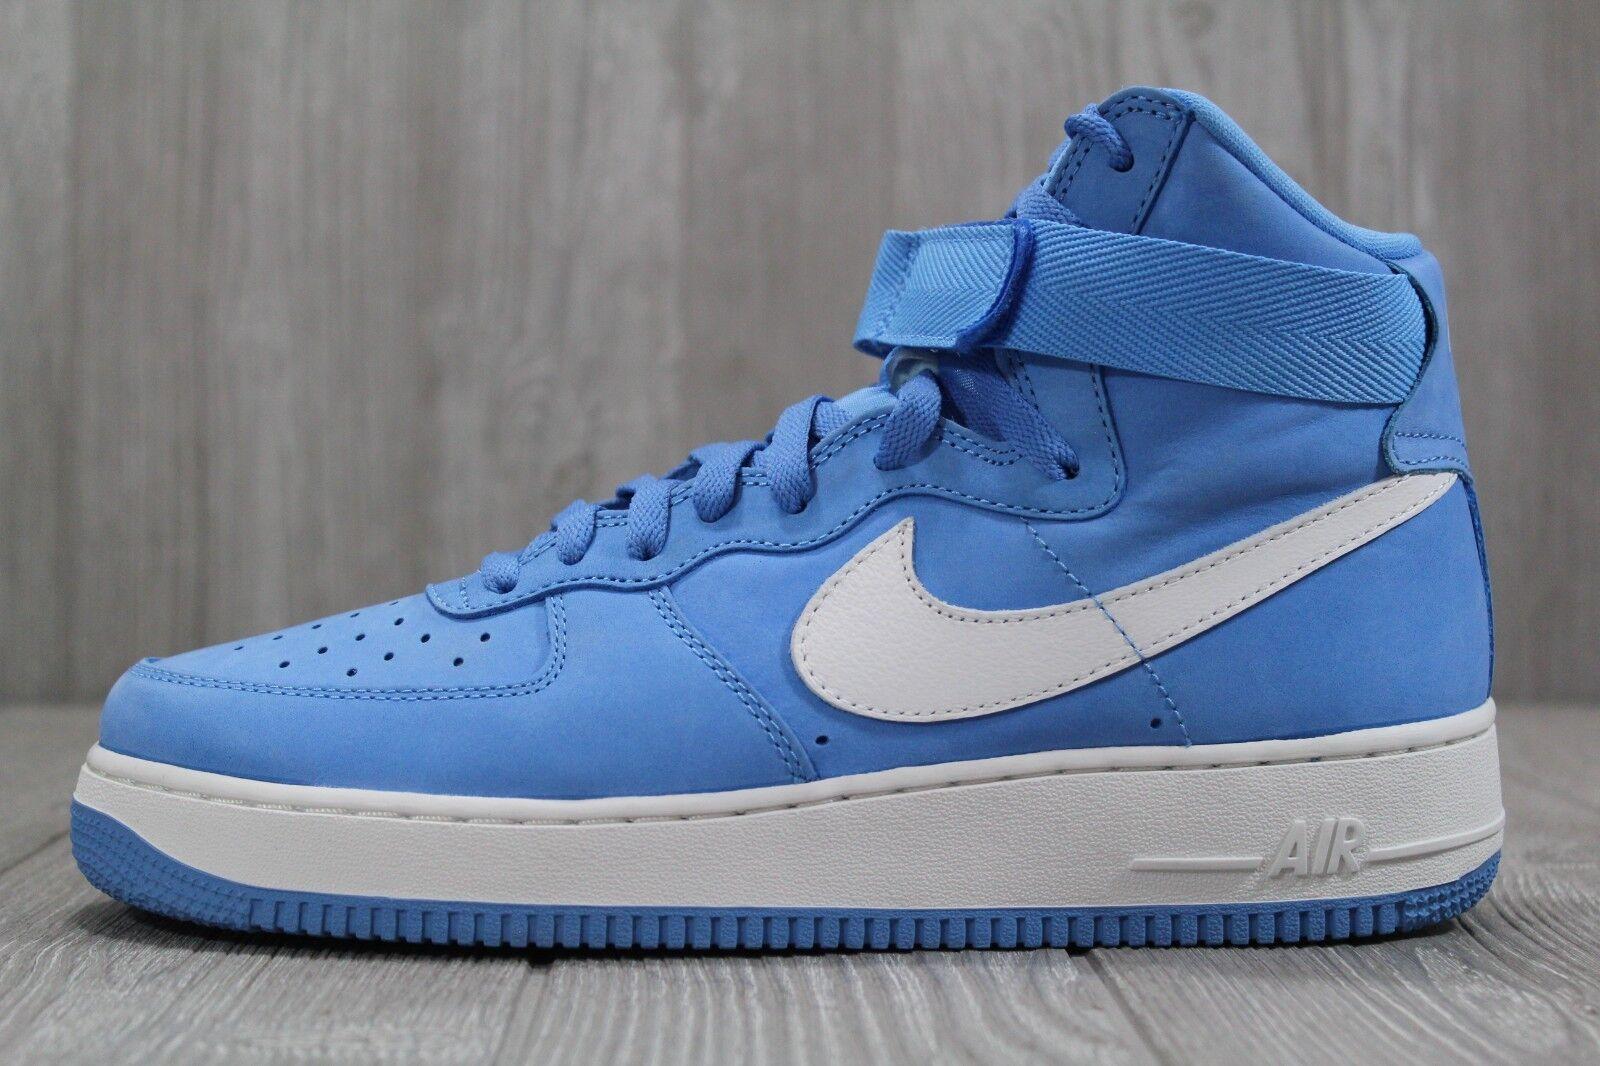 47e9c89794 36 Nike AF1 Air Force 1 Hi Retro QS University bluee Carolina shoes  743546-400